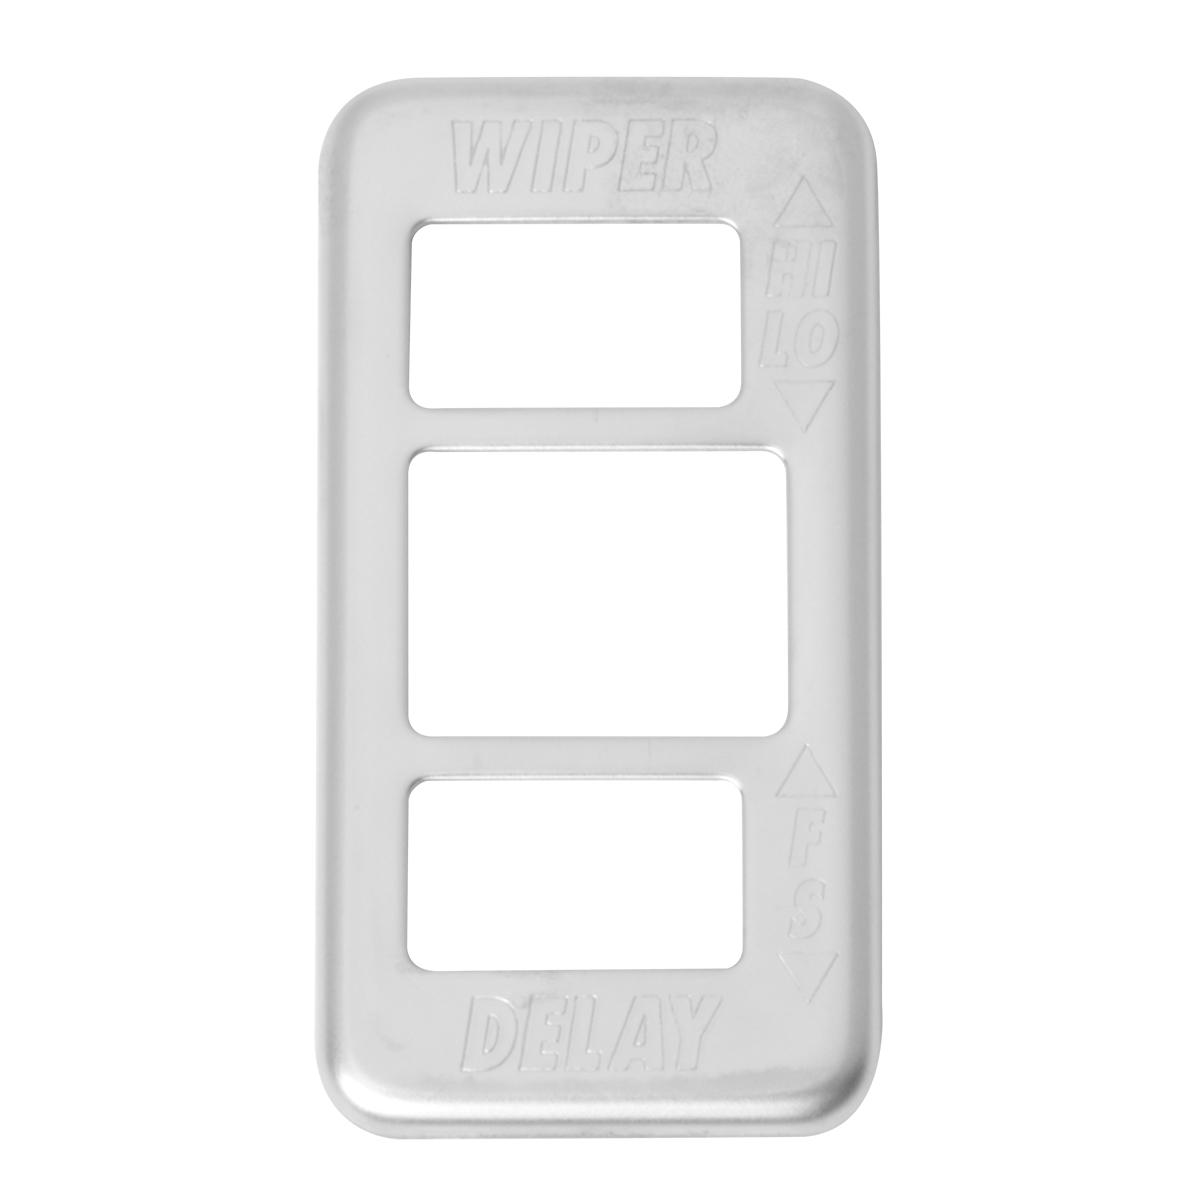 #68883 Switch Guard Wiper/Washer Plate